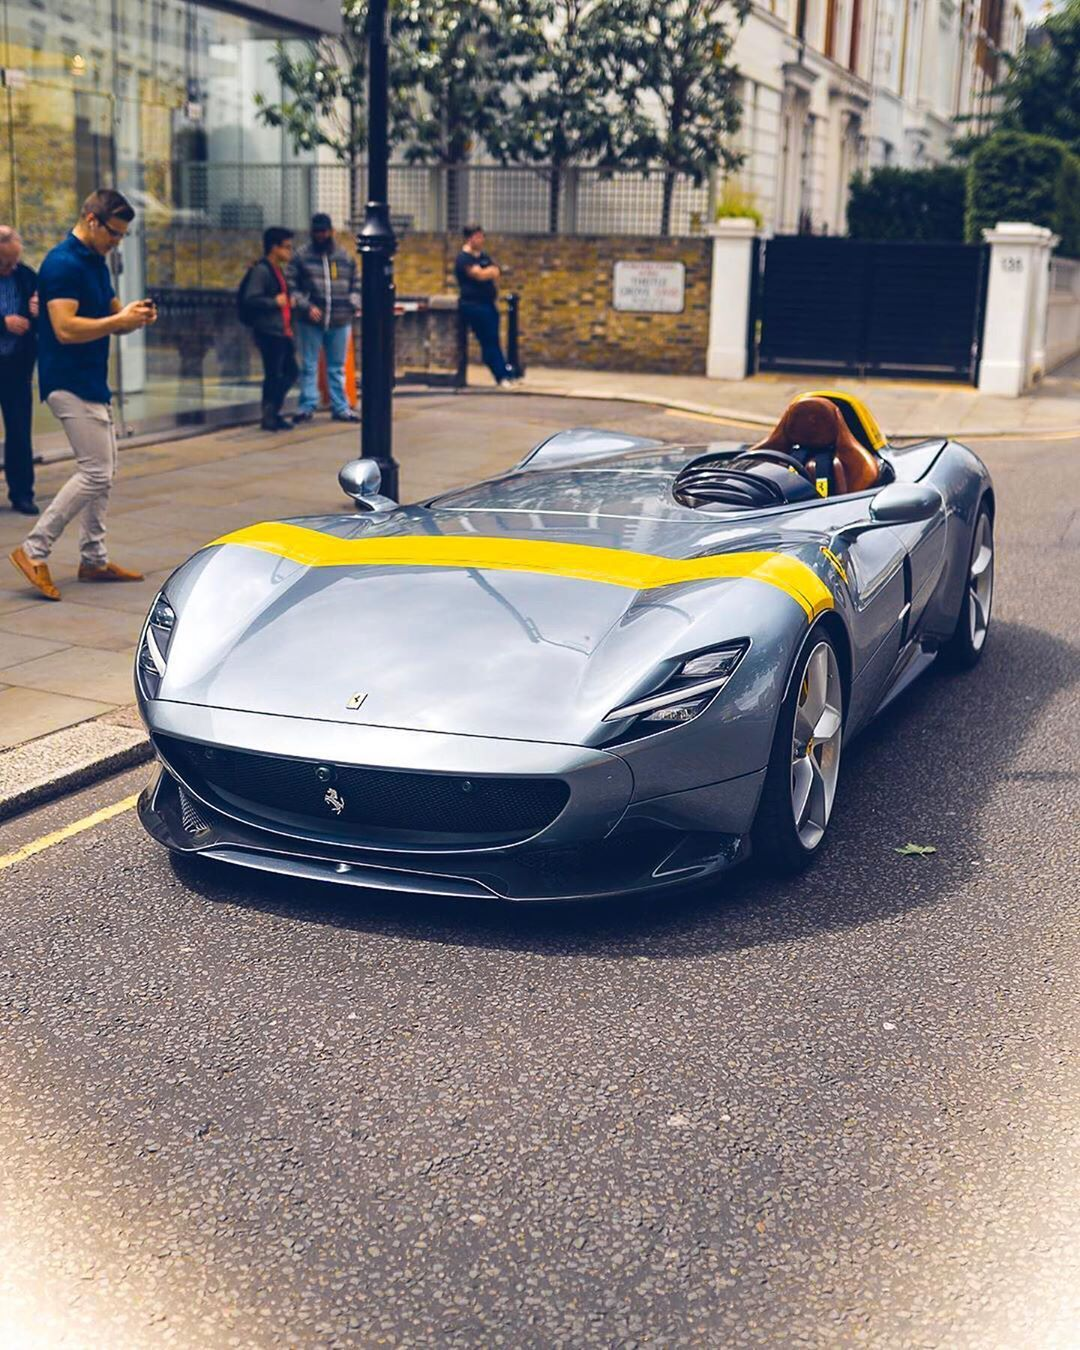 Ferrari Limited Edition On Instagram Ferrari Icona Series Monza Sp1 Sammooresphoto Ferrari Top Cars Sport Cars